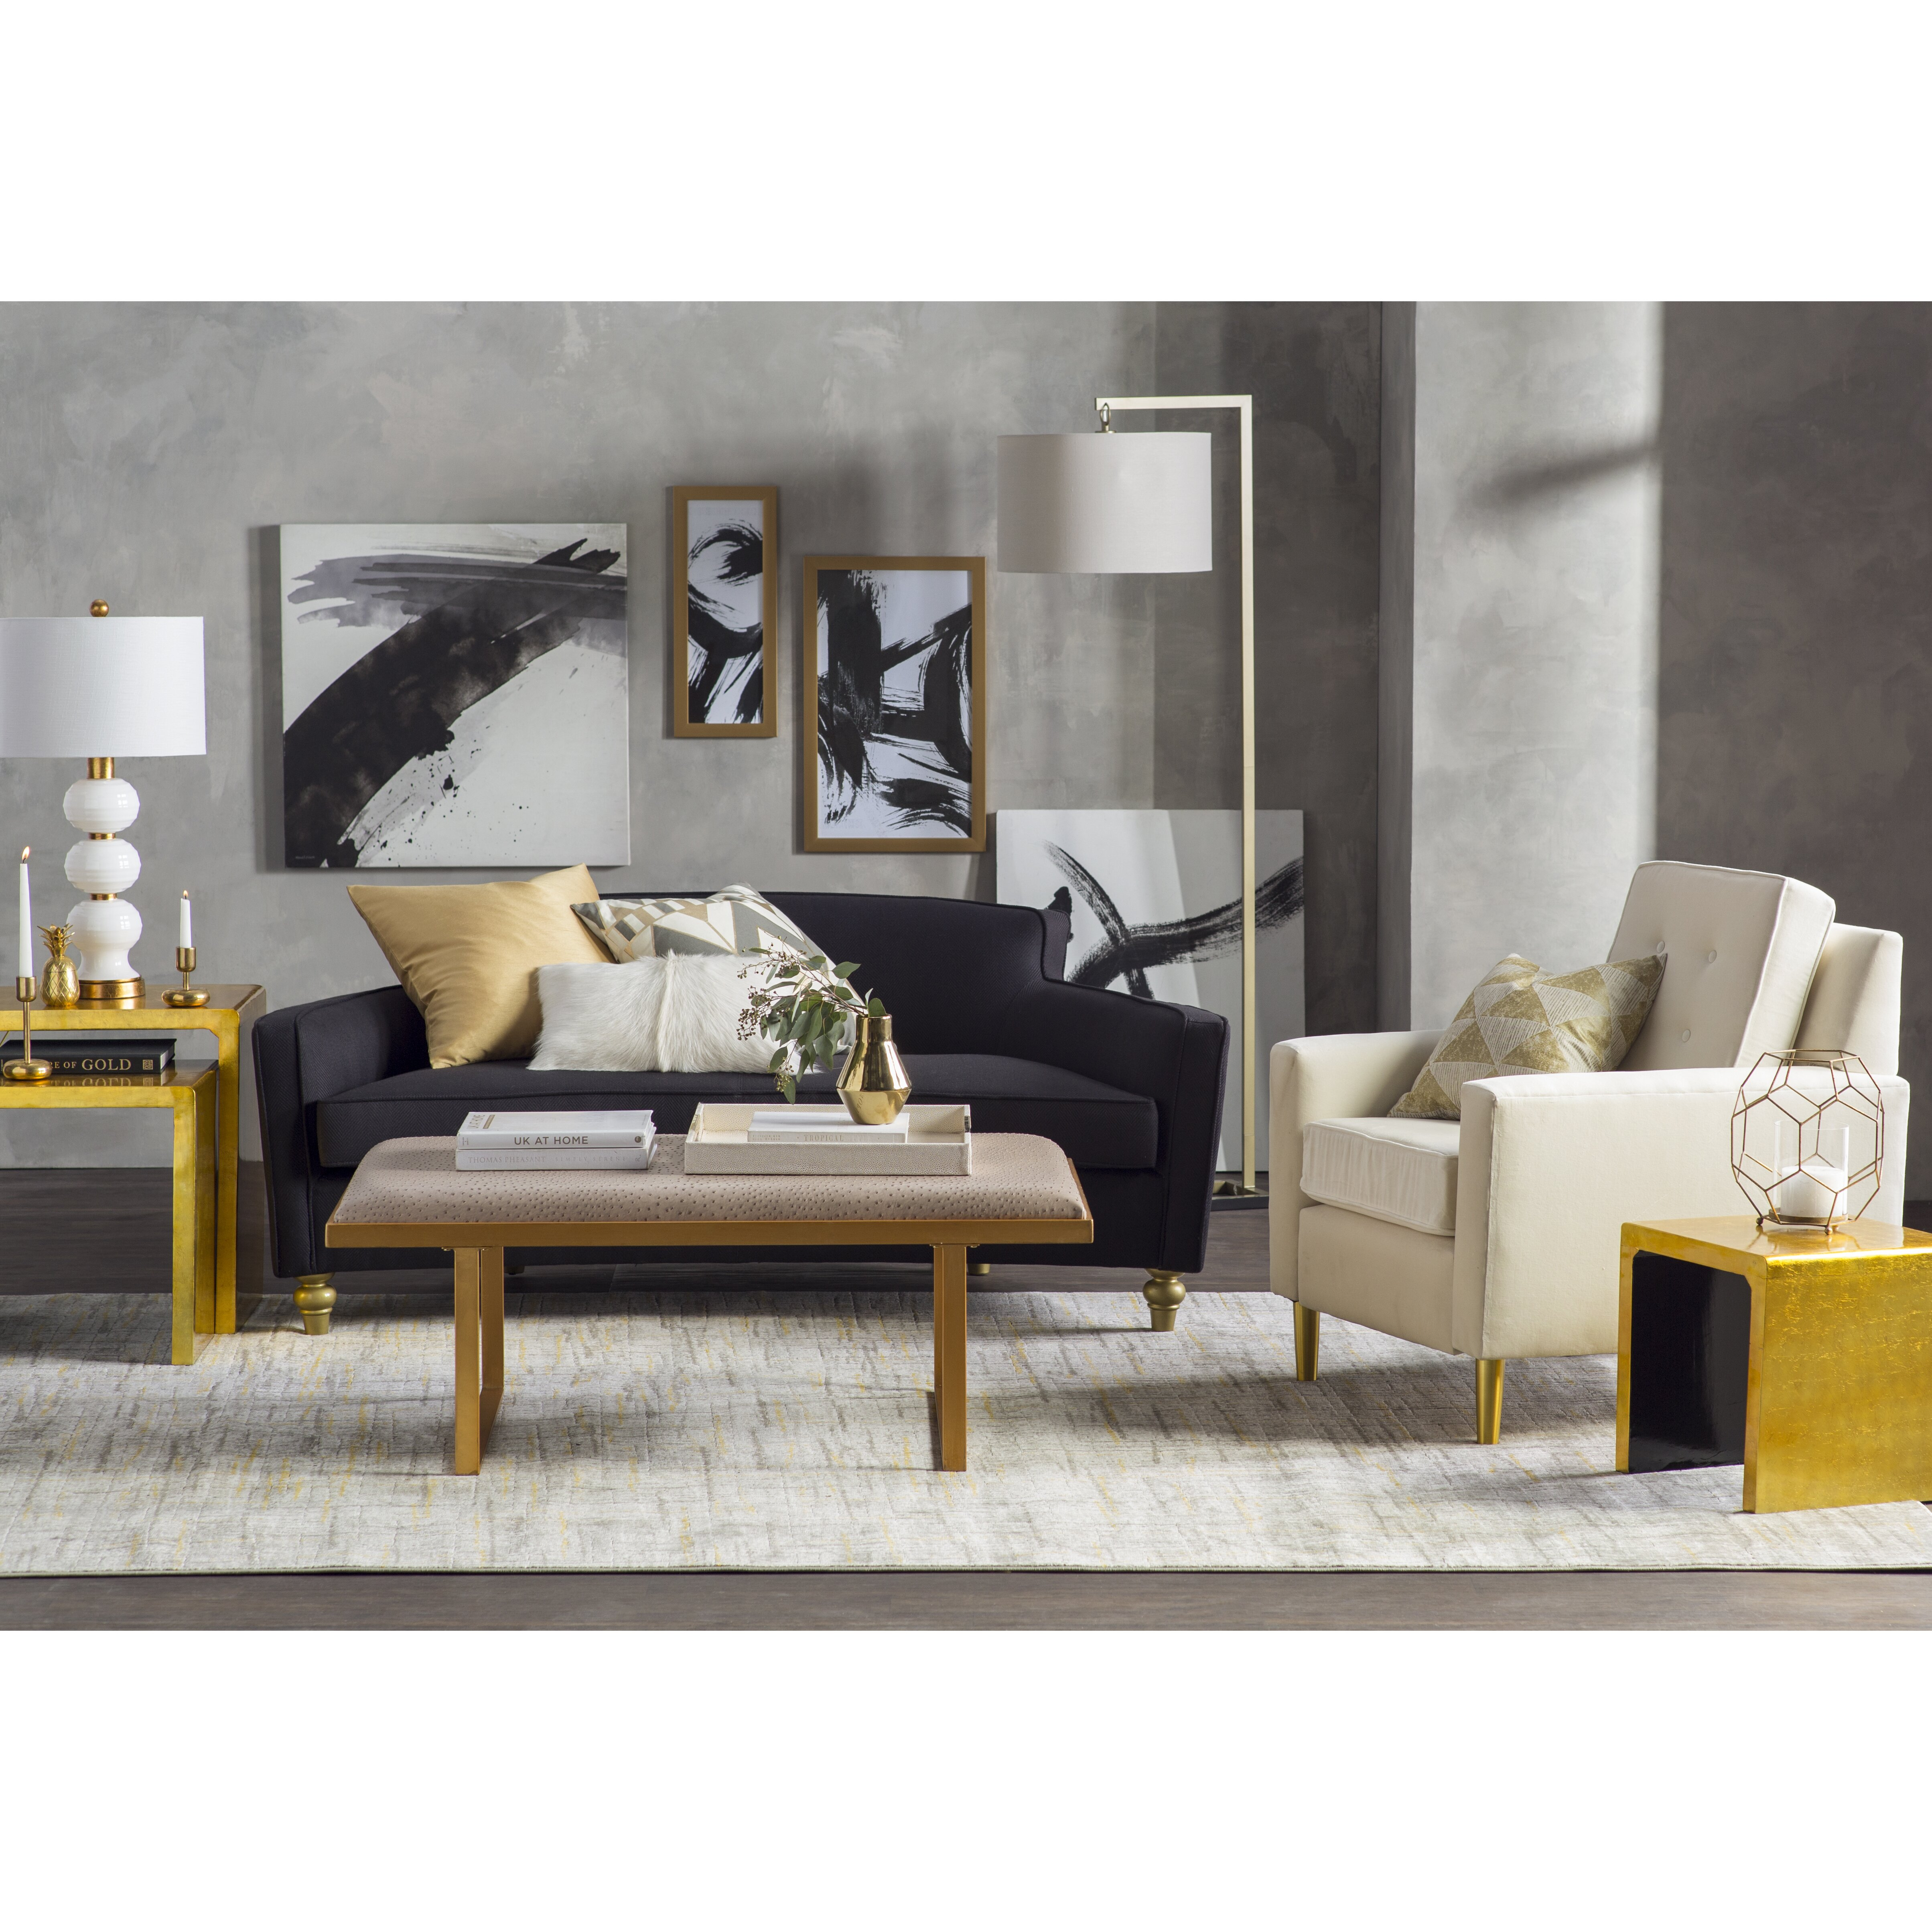 Room And Board Reese Sofa Review – Mjob Blog